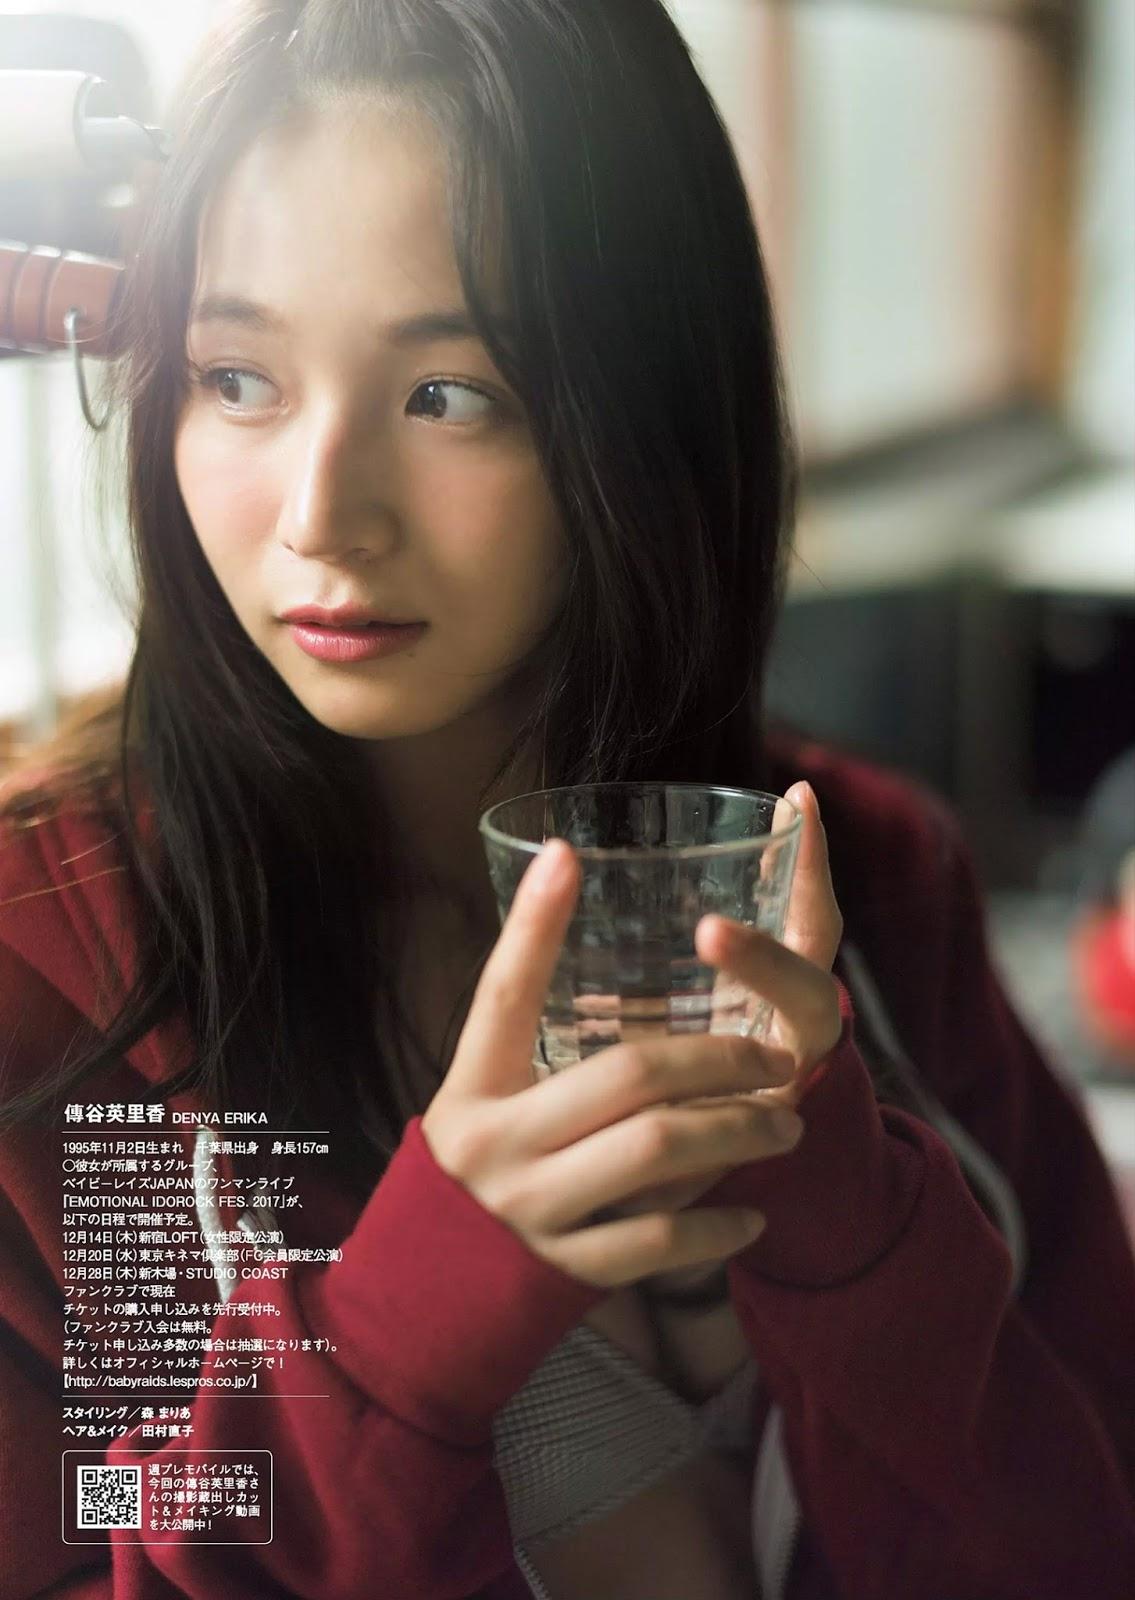 Denya Erika 傳谷英里香, Weekly Playboy 2017 No.44 (週刊プレイボーイ 2017年44号)